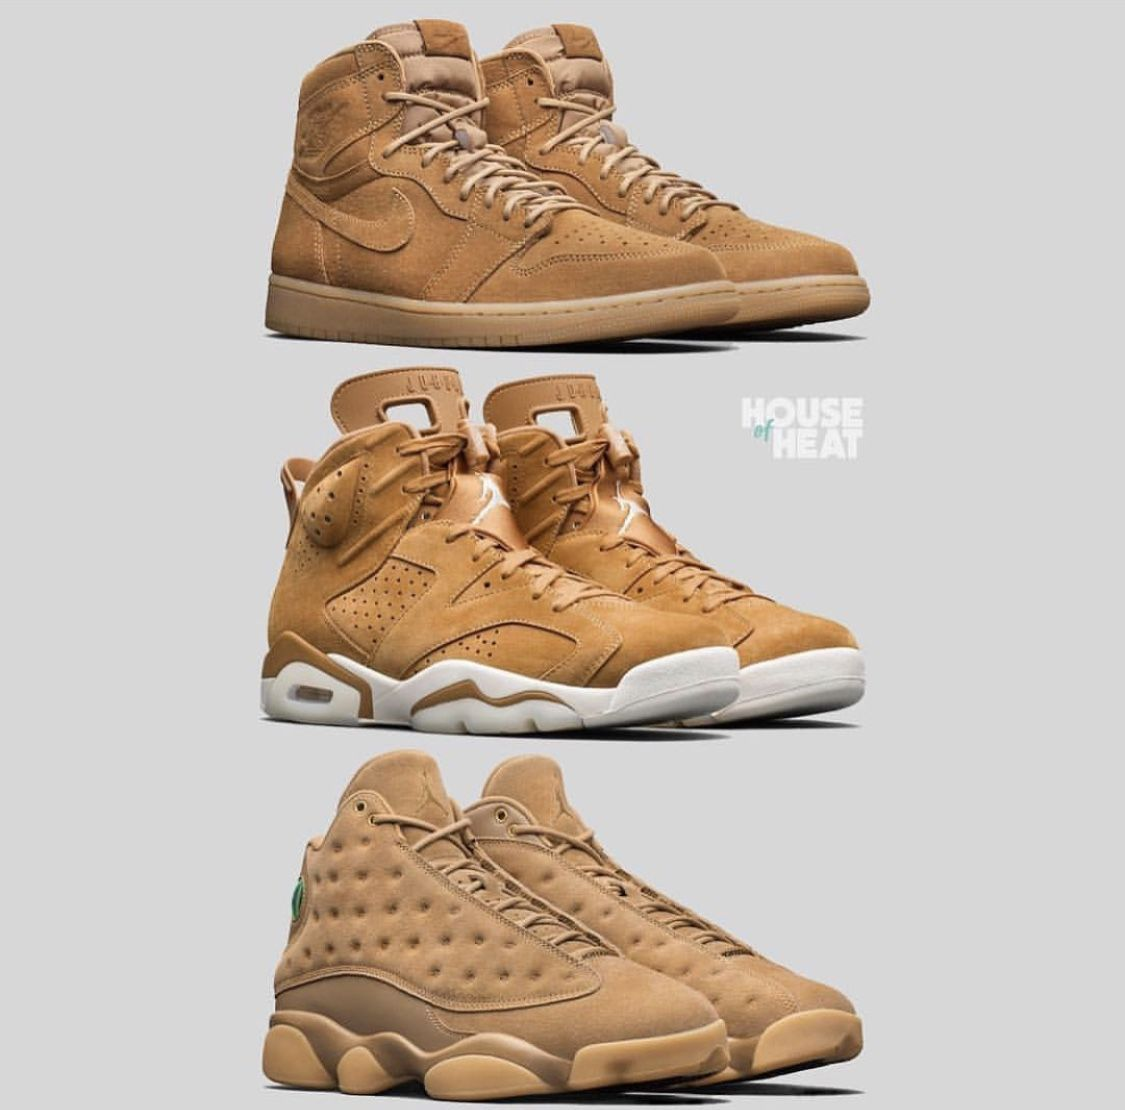 Air Jordan Wheat Collection